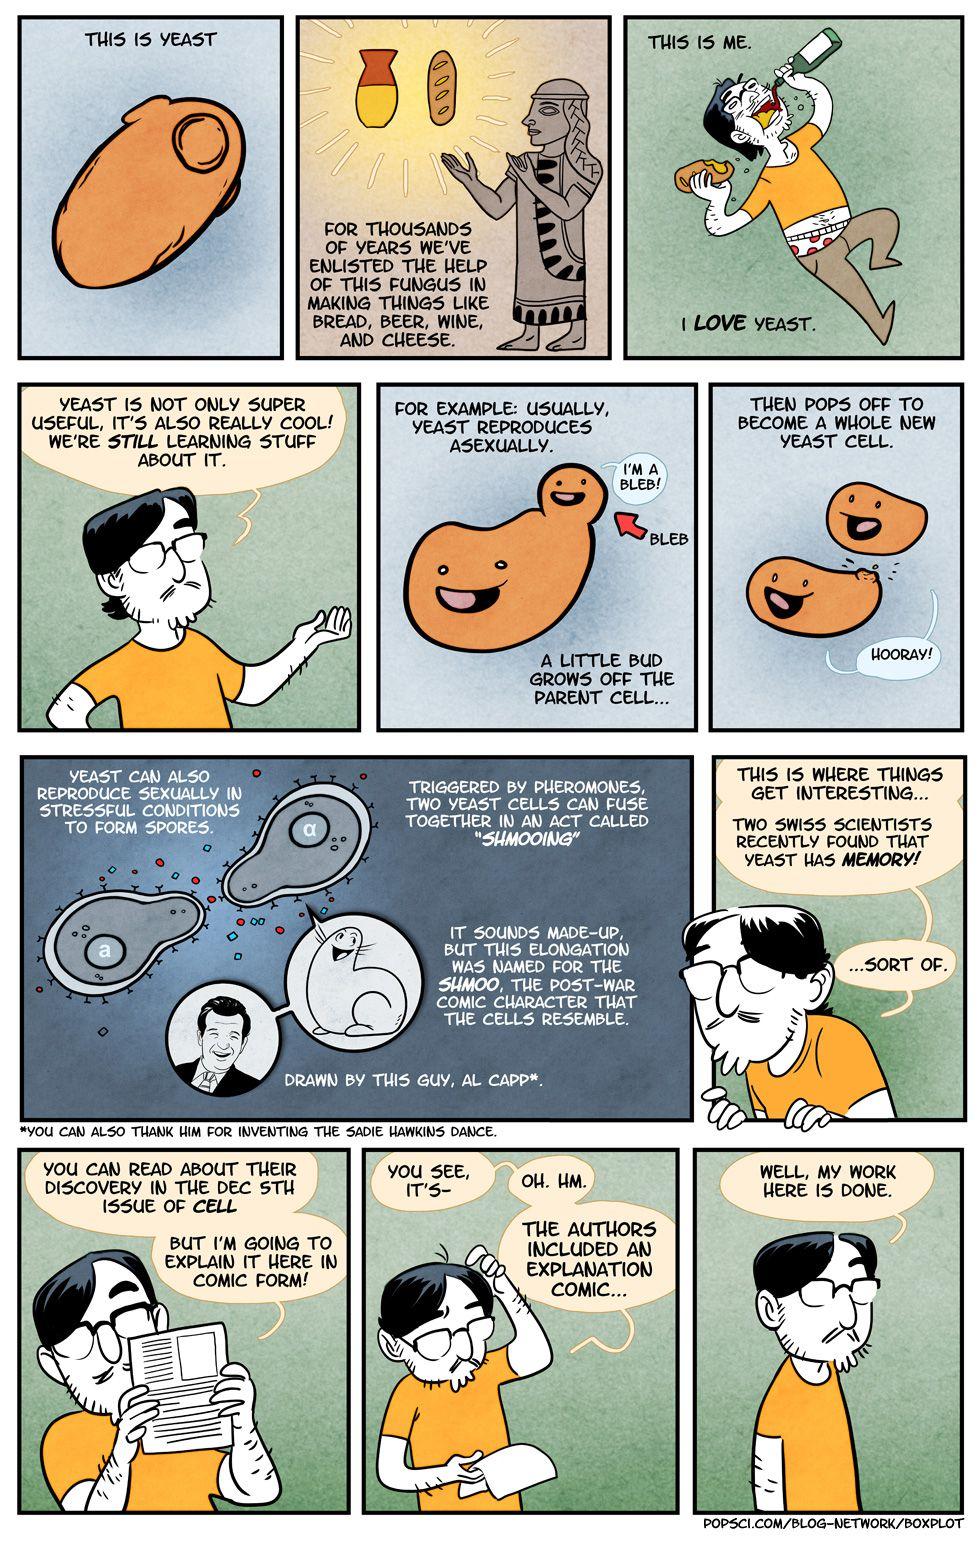 Scooped | Popular Science